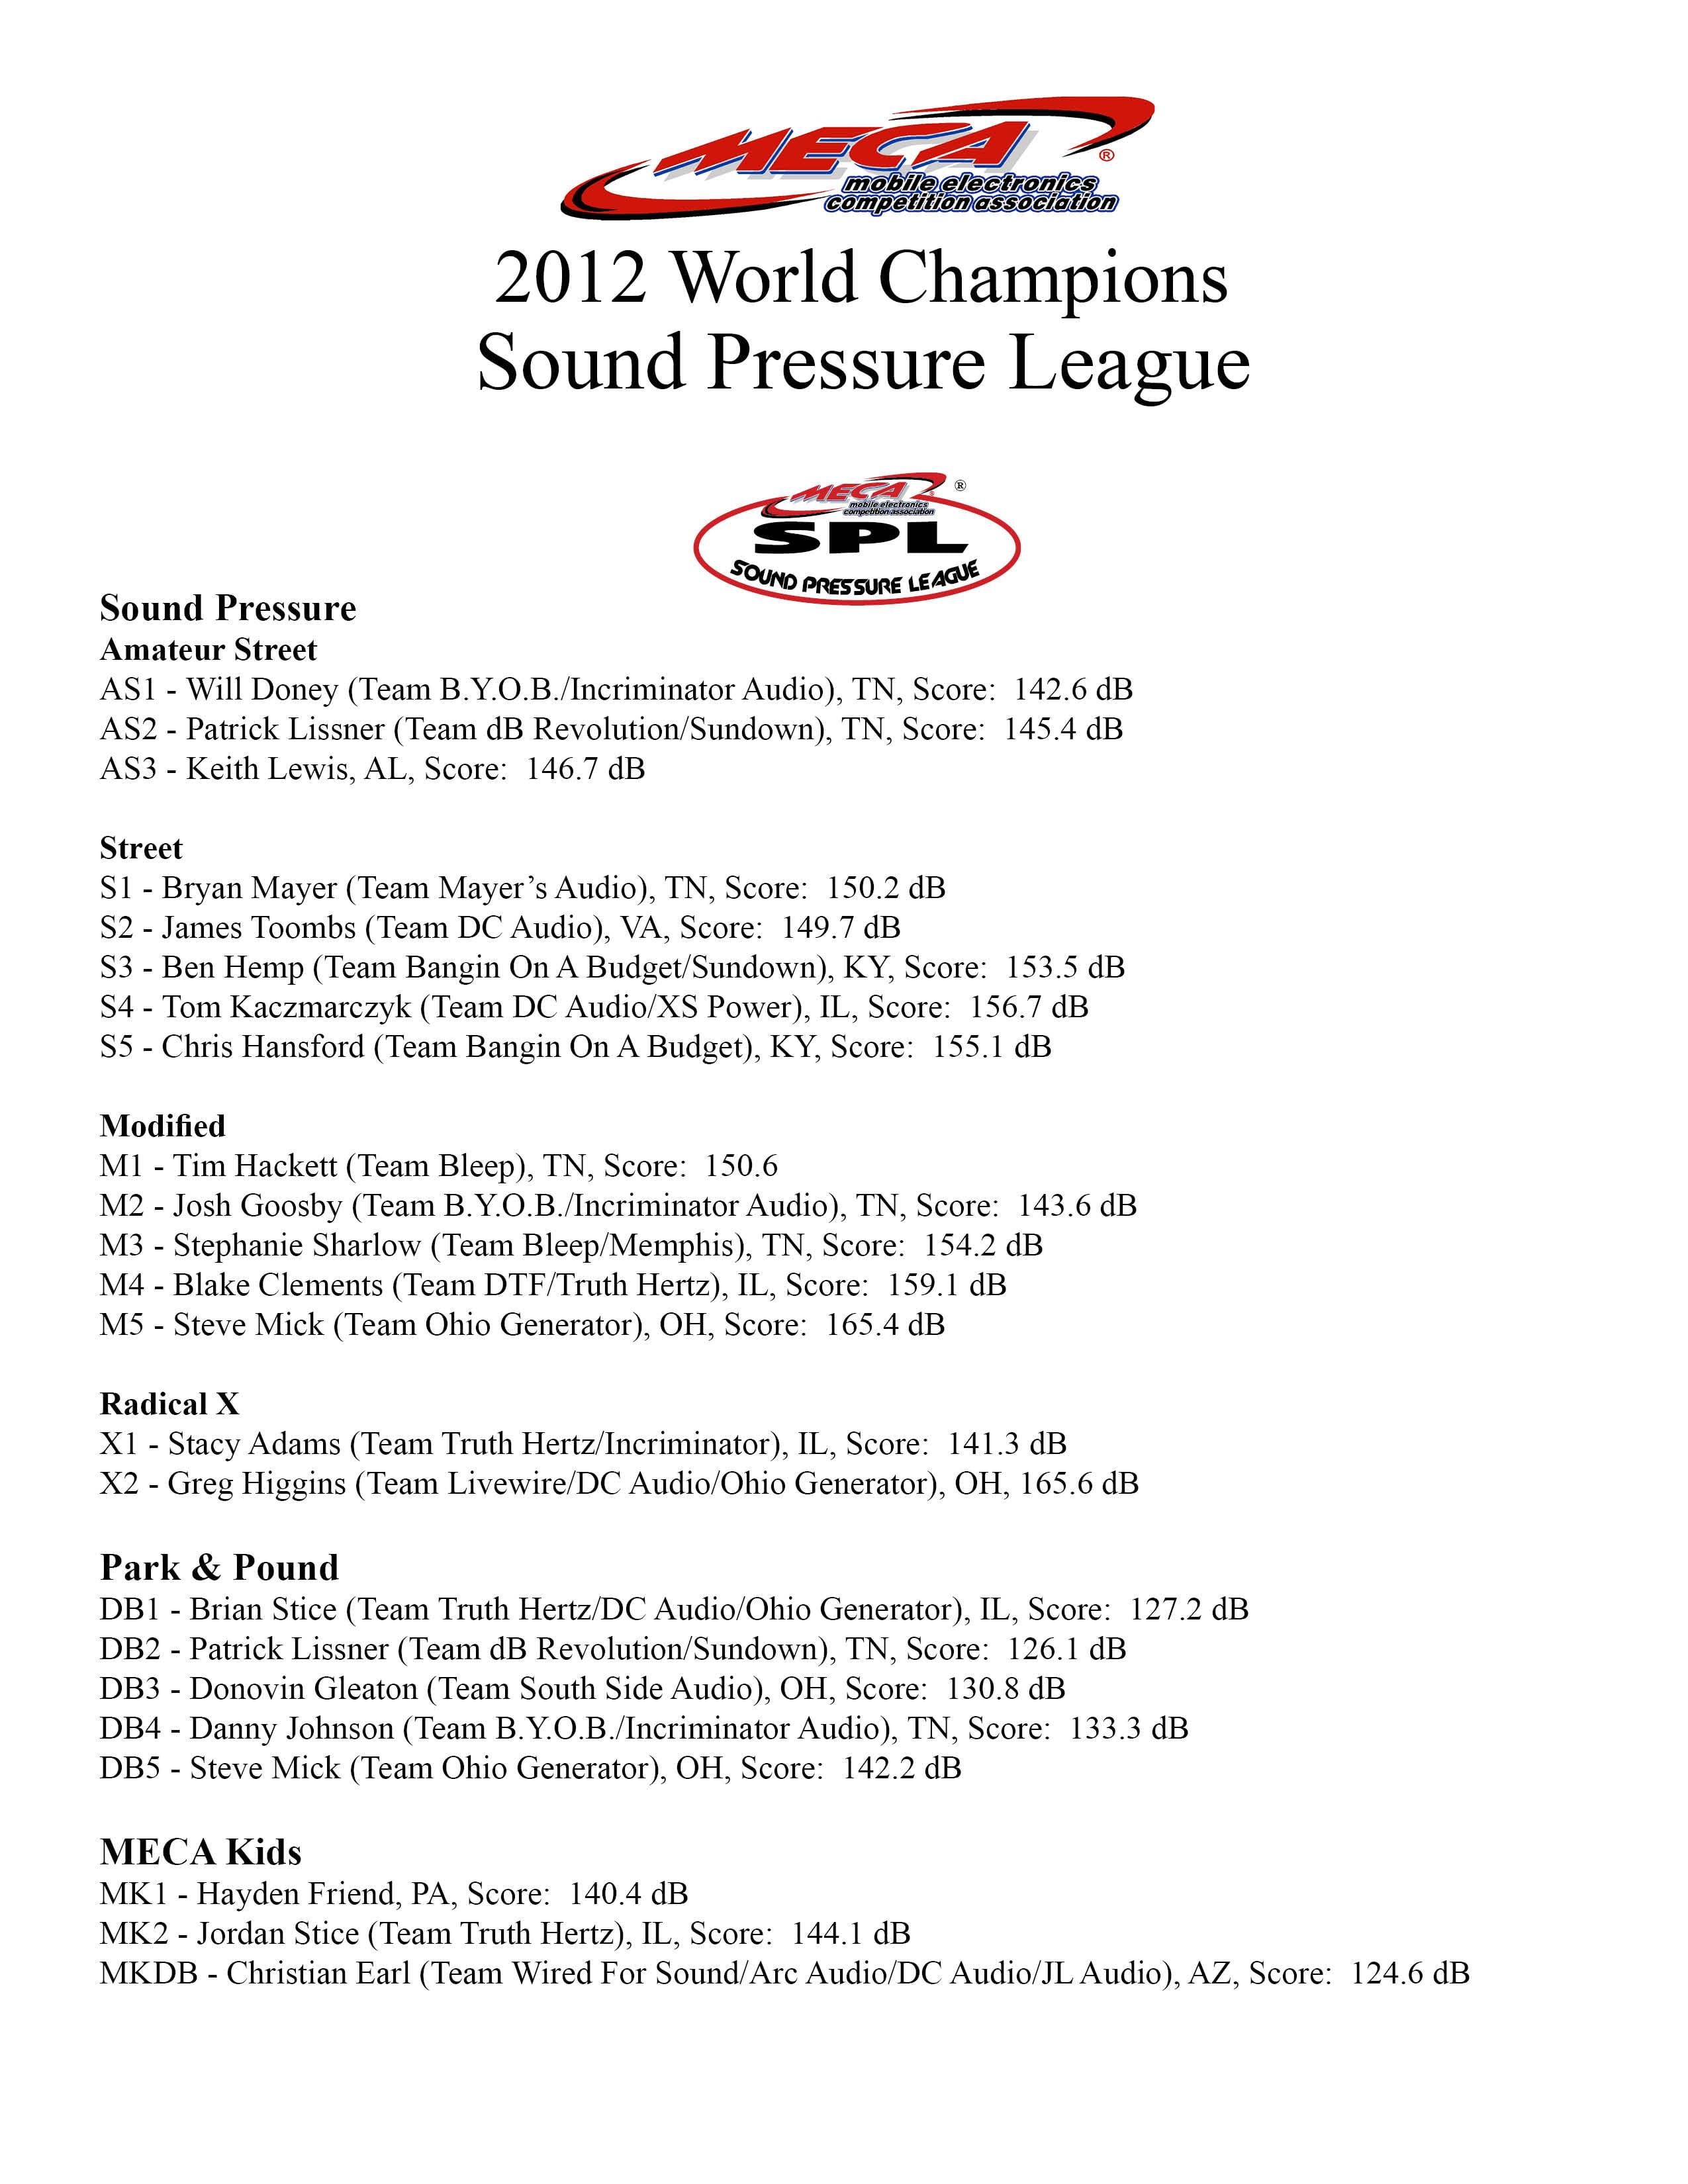 2012 Sound Pressure League Champions